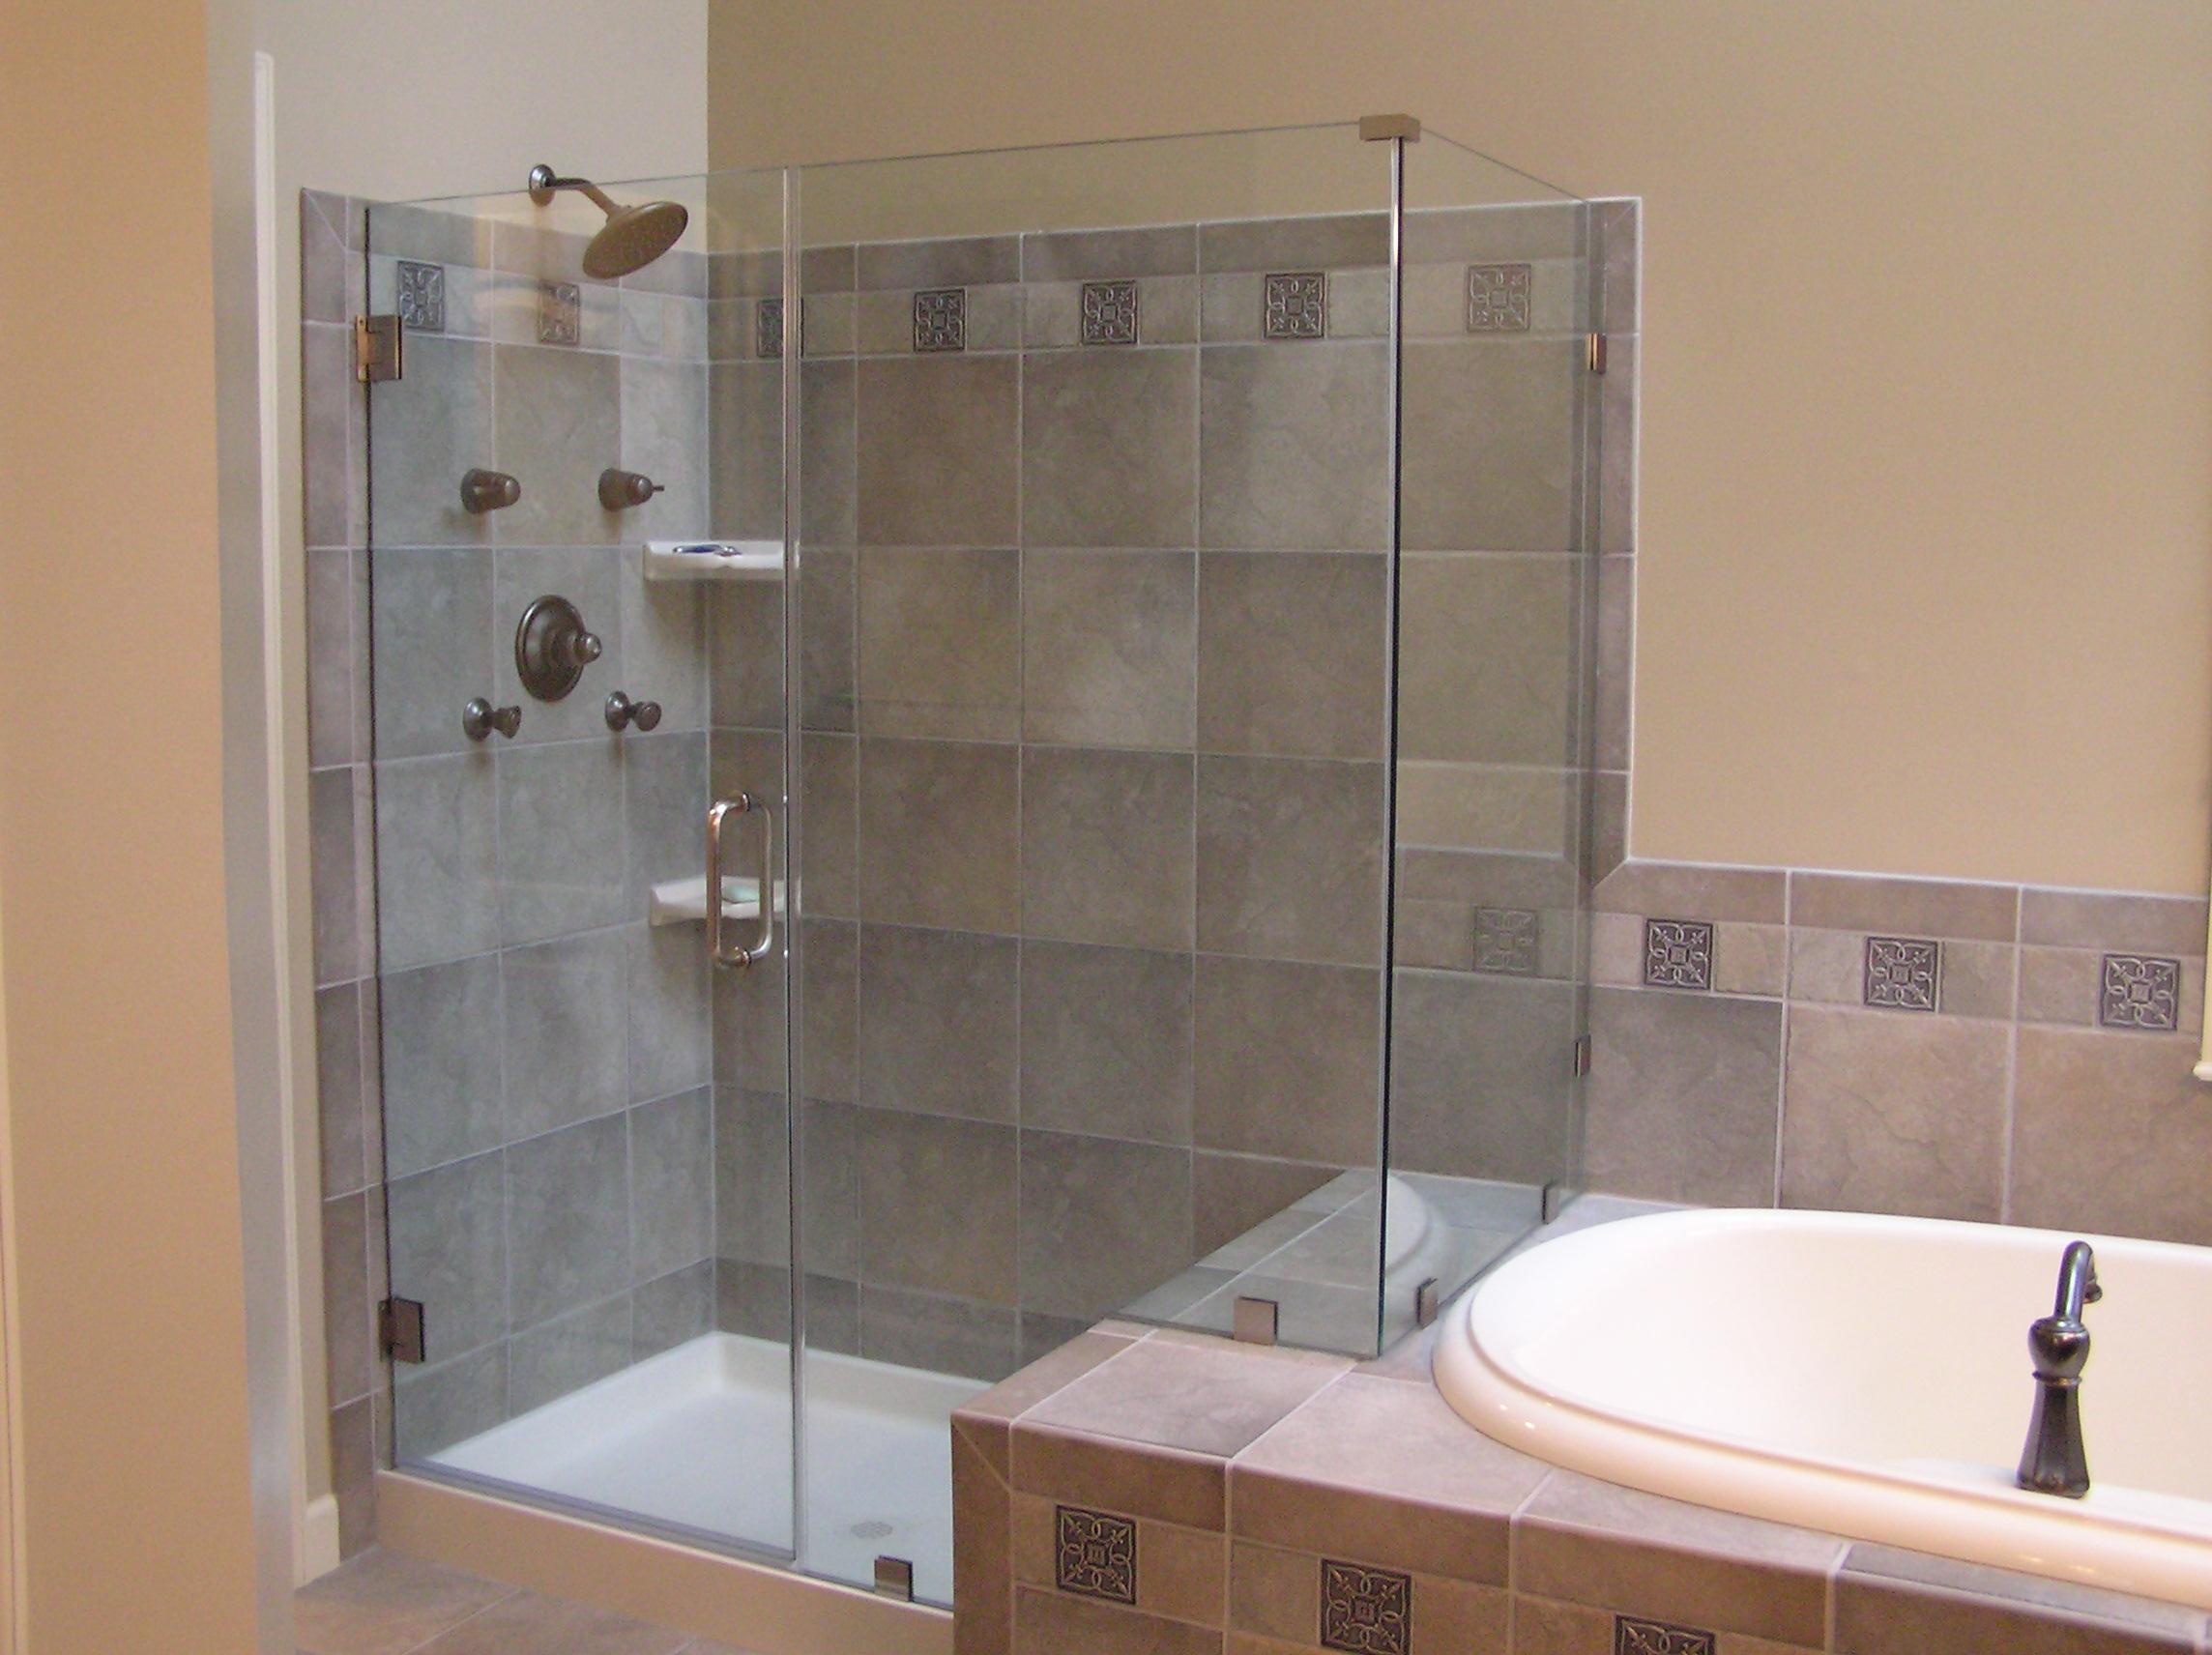 Bathroom Remodel Delaware - Home Improvement Contractors on Bathroom Renovation Ideas  id=92547